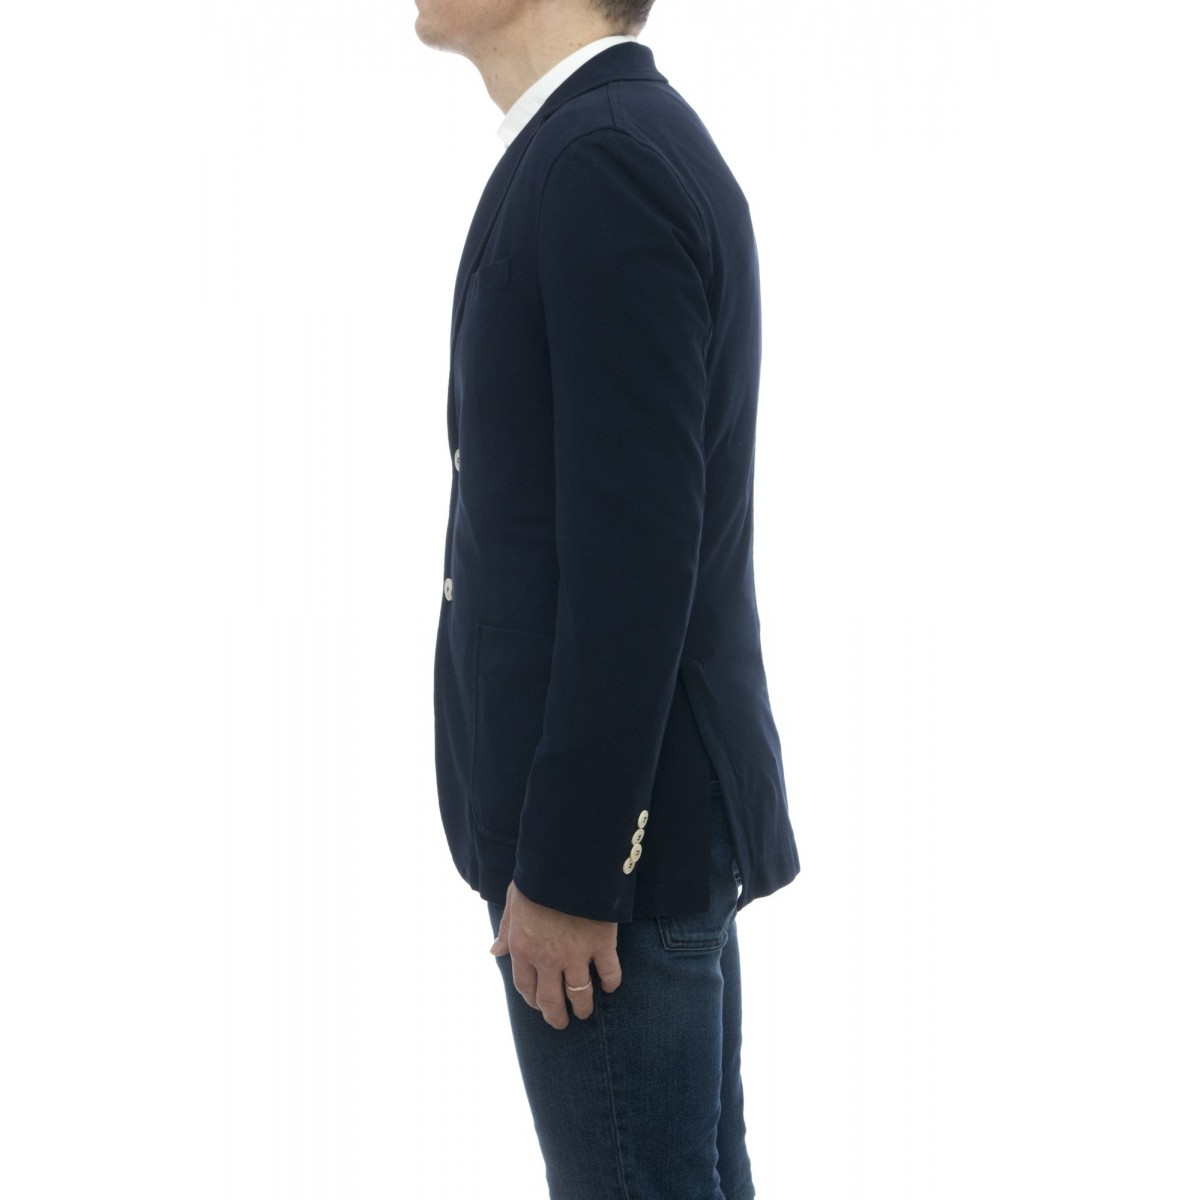 Giacca - Cn1802 giacca light jersey